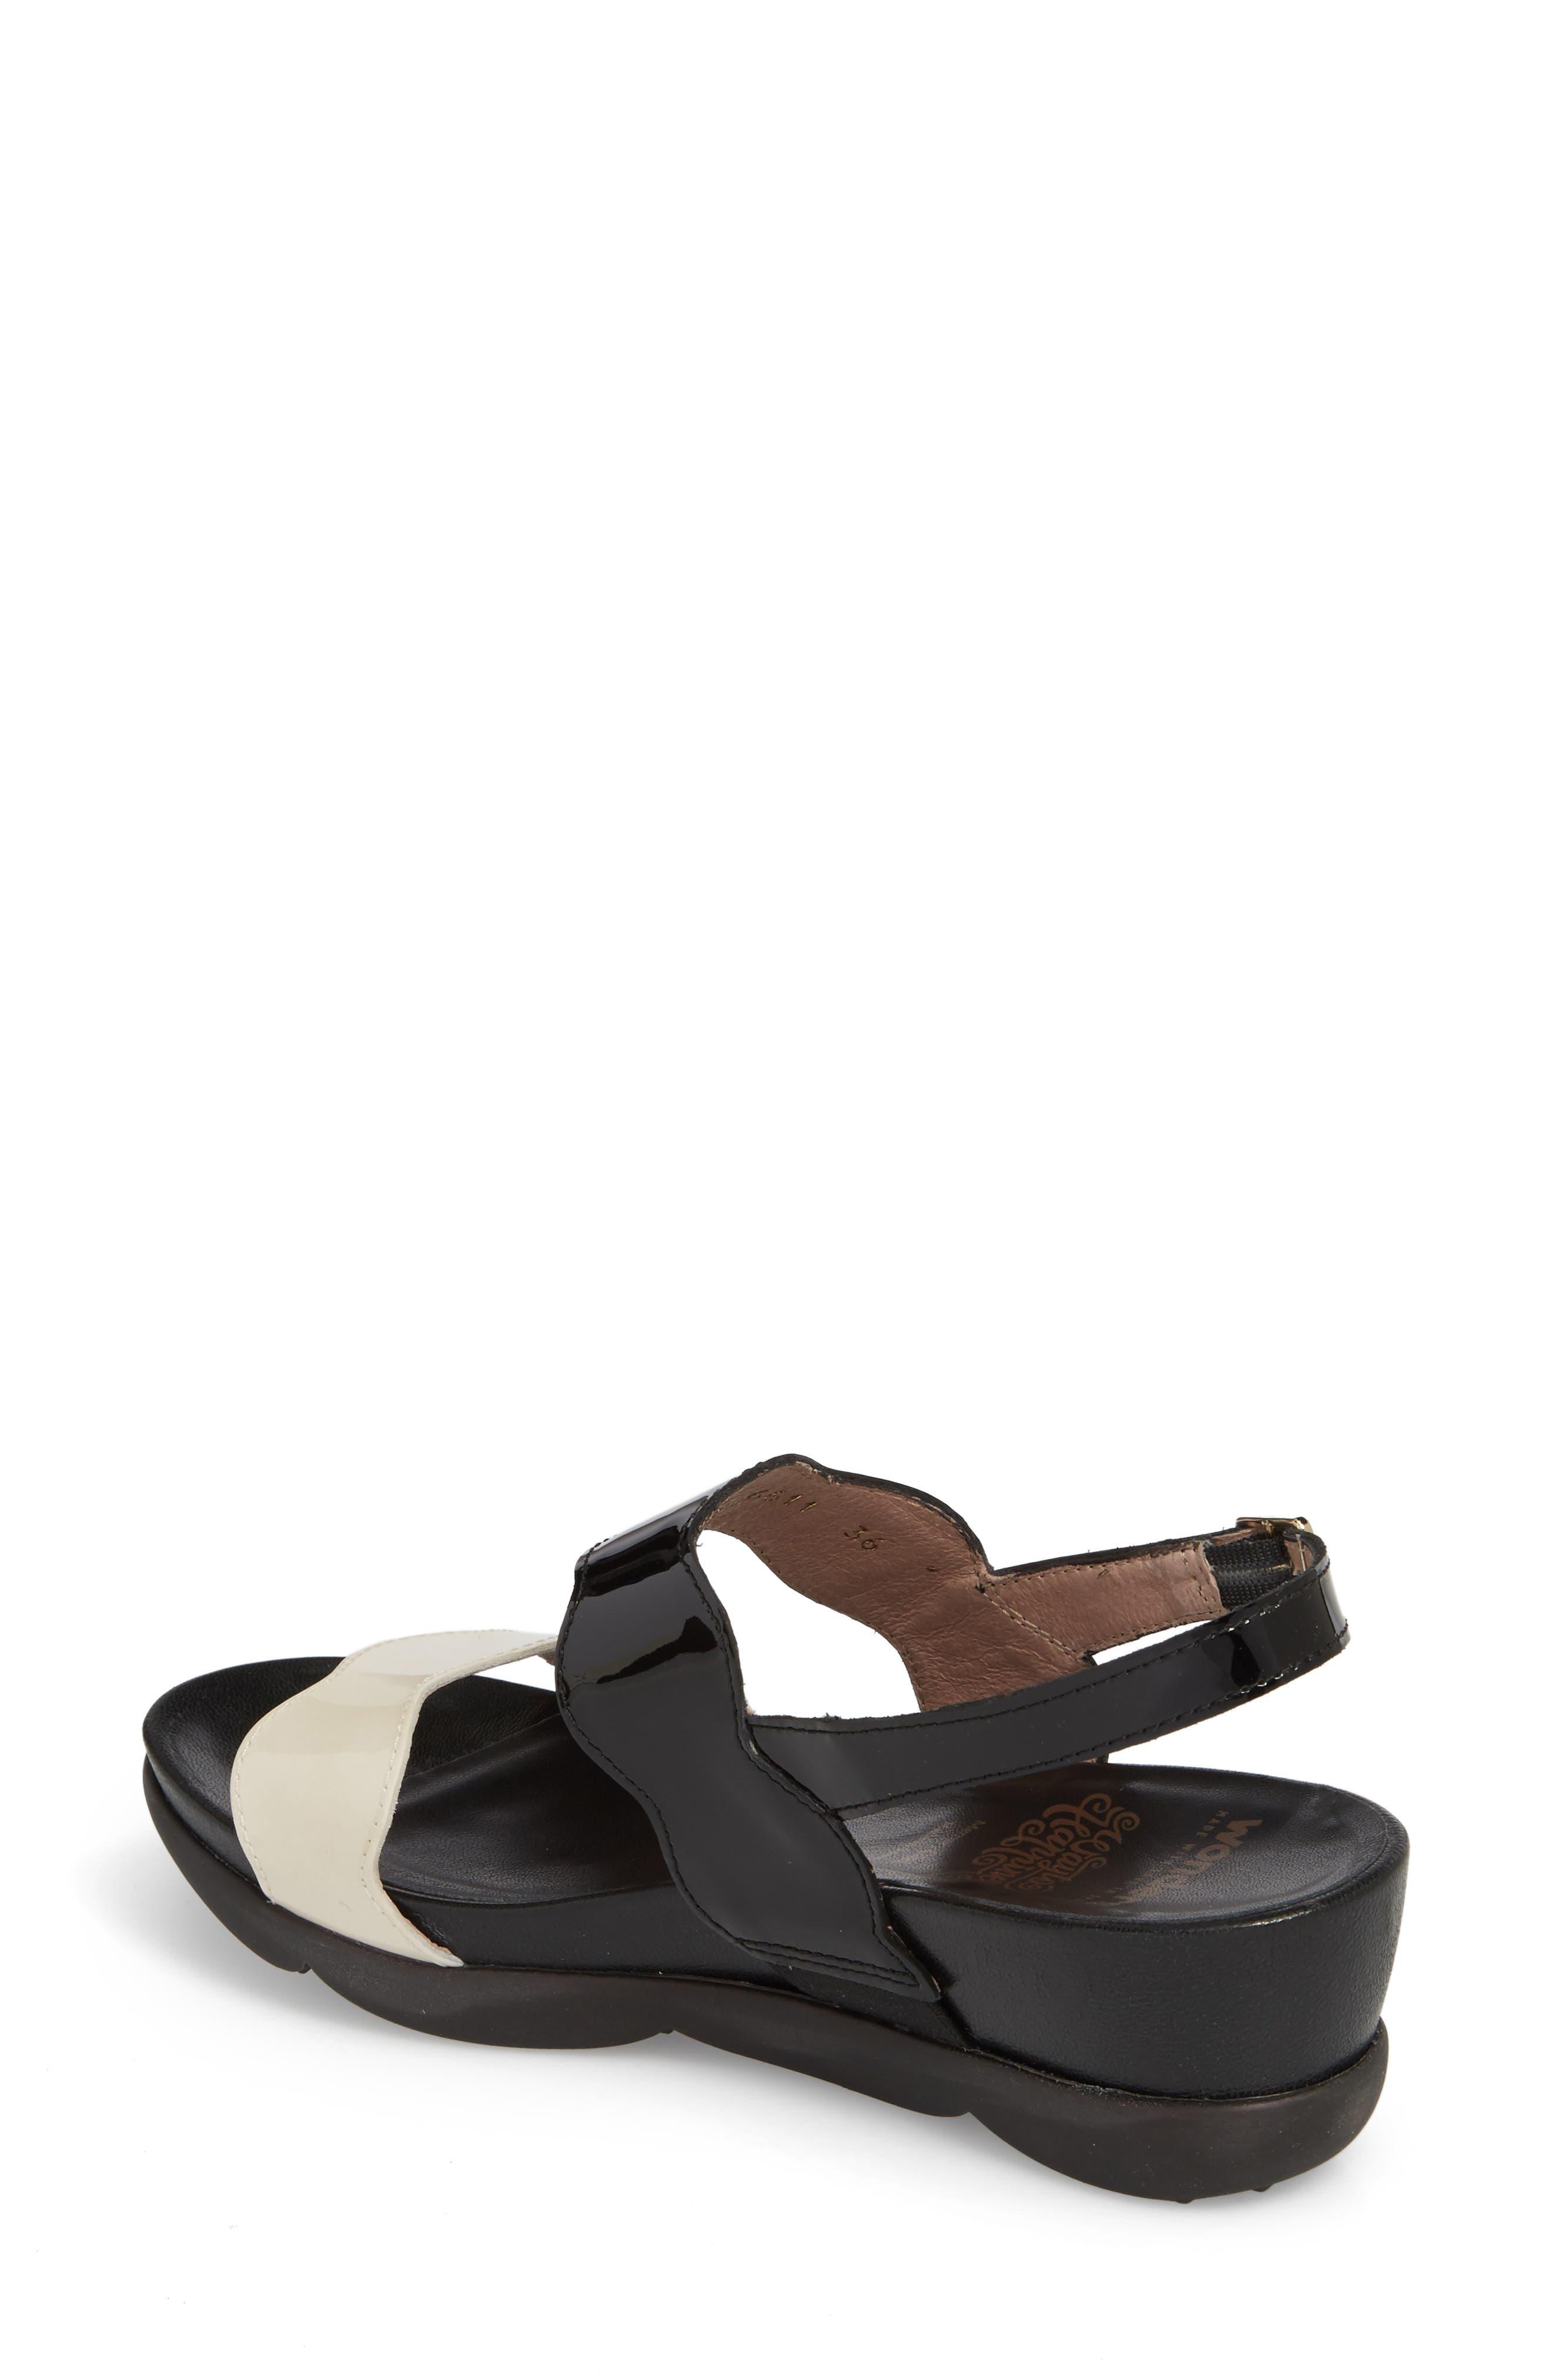 Wedge Sandal,                             Alternate thumbnail 2, color,                             Black/ Off Leather